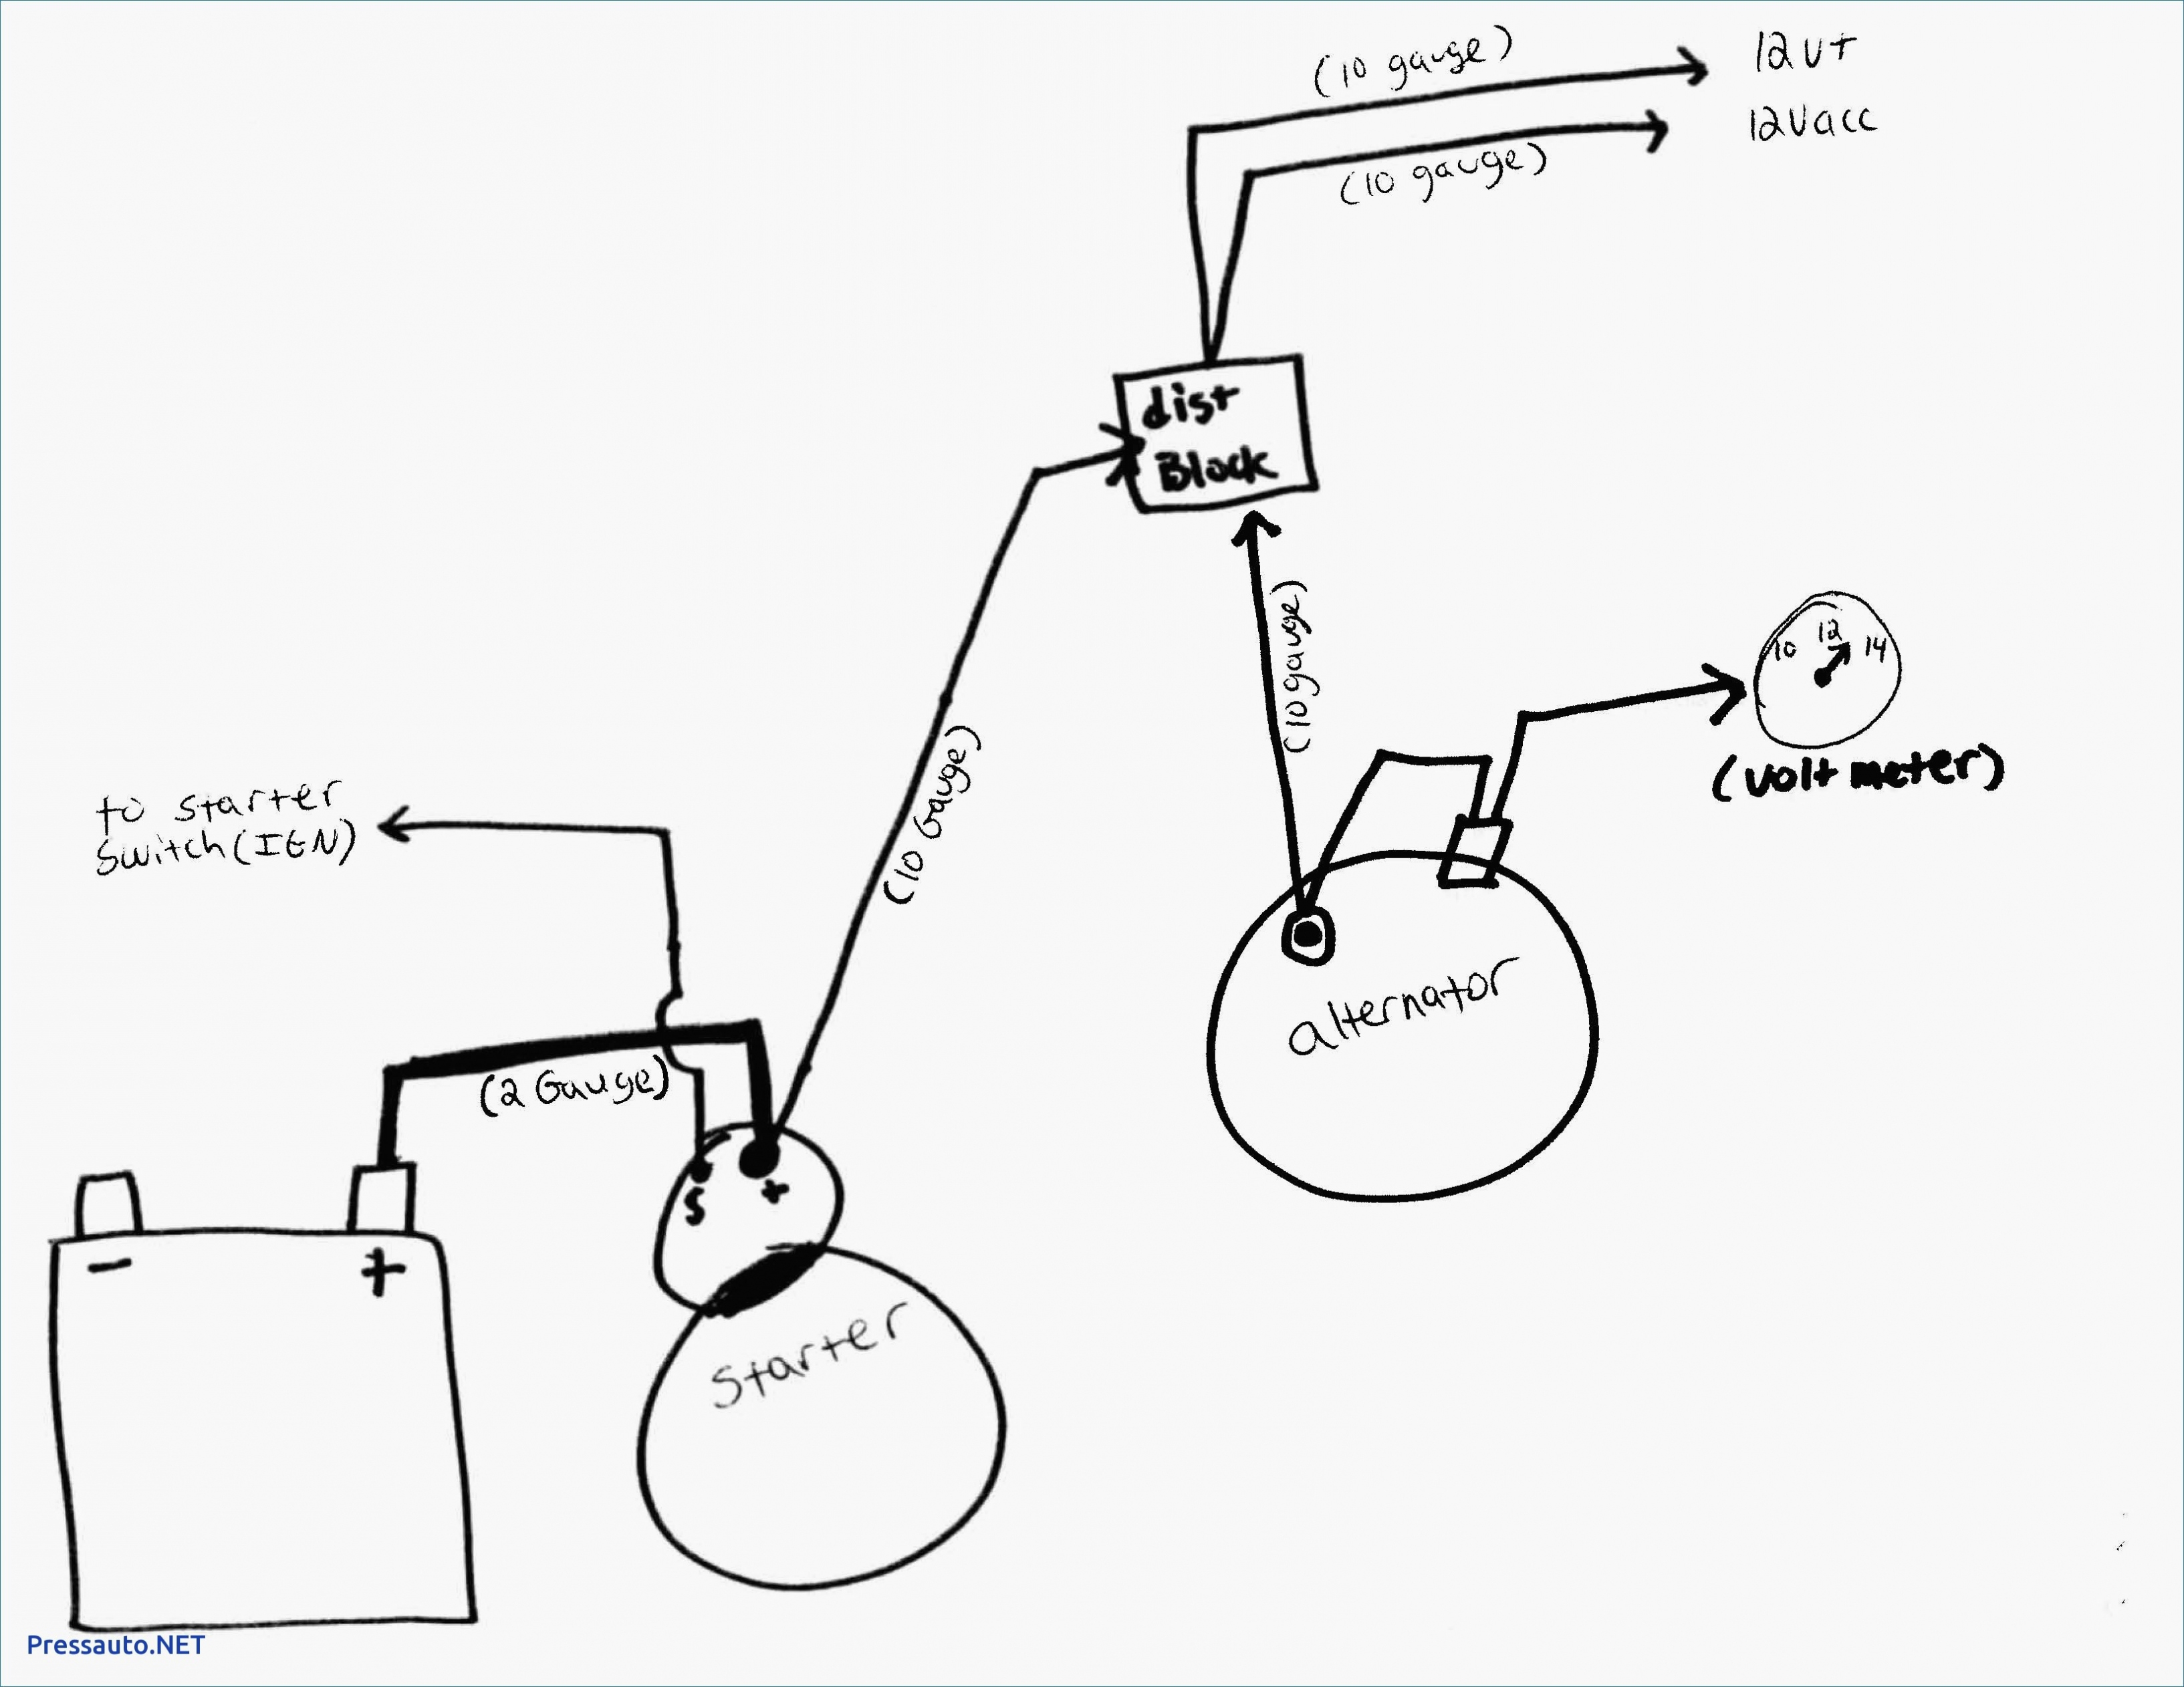 Gm Alternator Wiring Diagram Internal Regulator New Fresh 3 Wire - Gm Alternator Wiring Diagram Internal Regulator